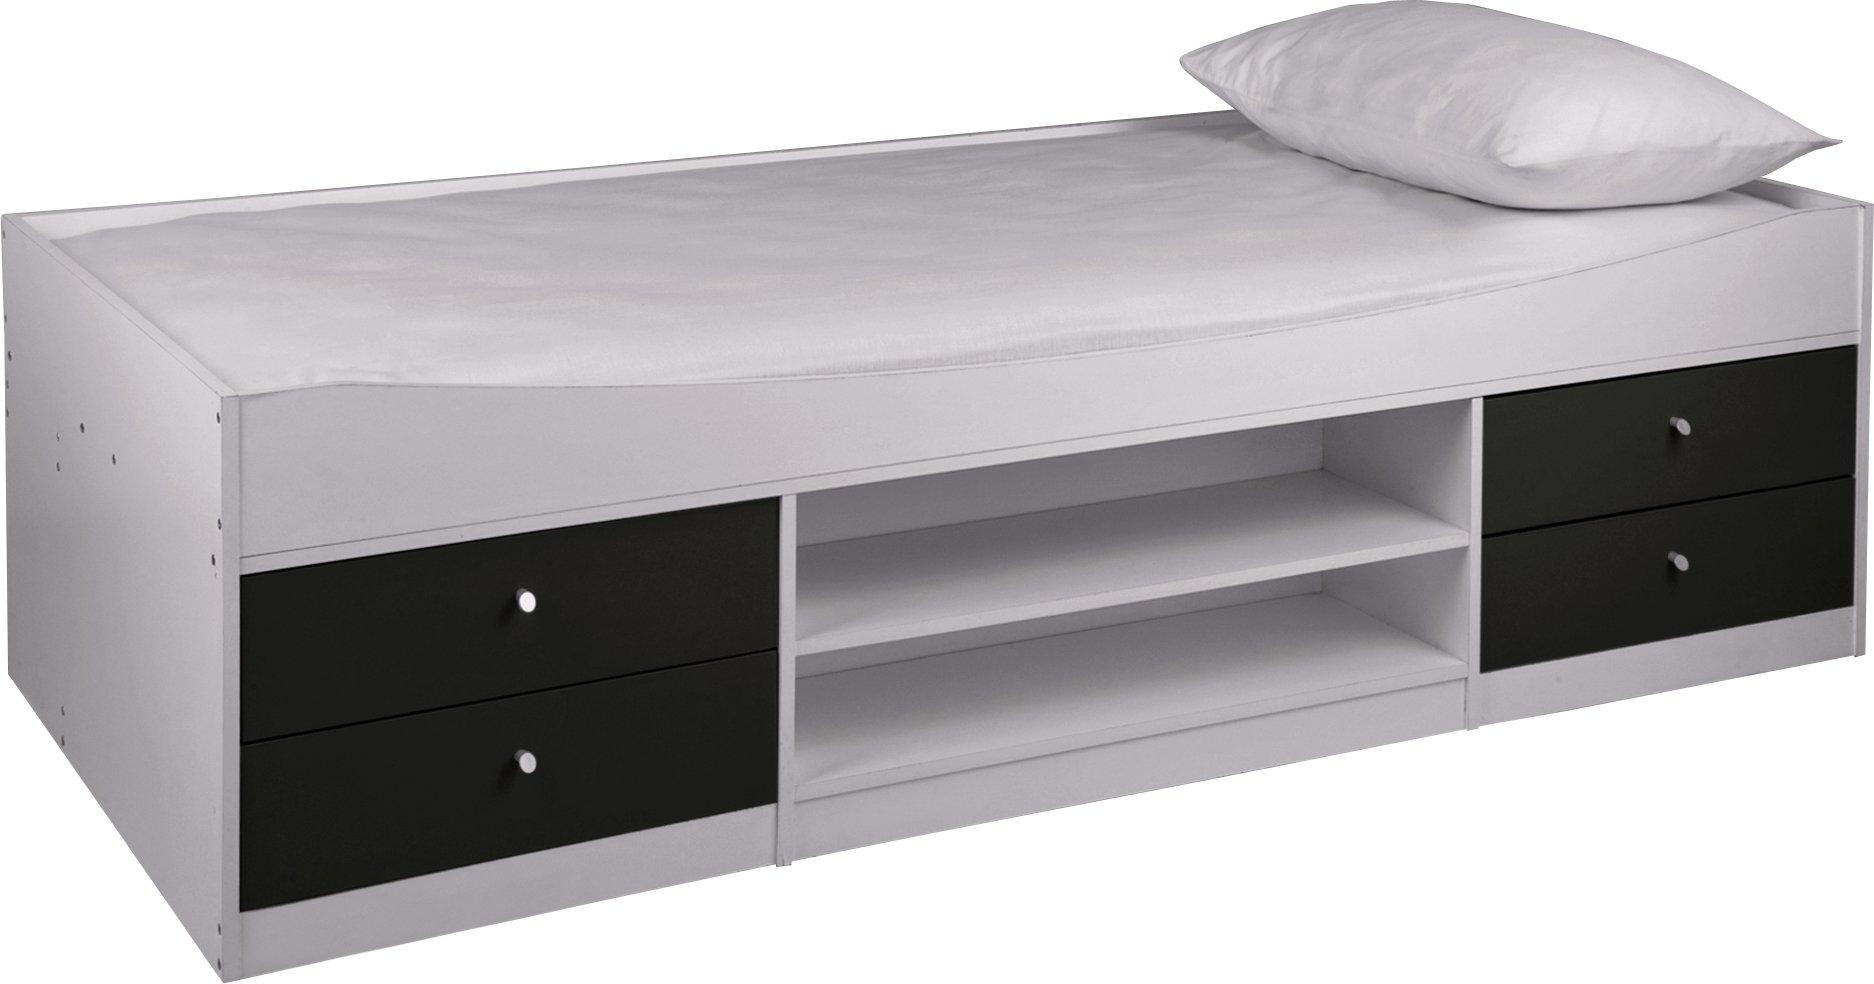 Argos Home Malibu Cabin Bed Frame - Black On White